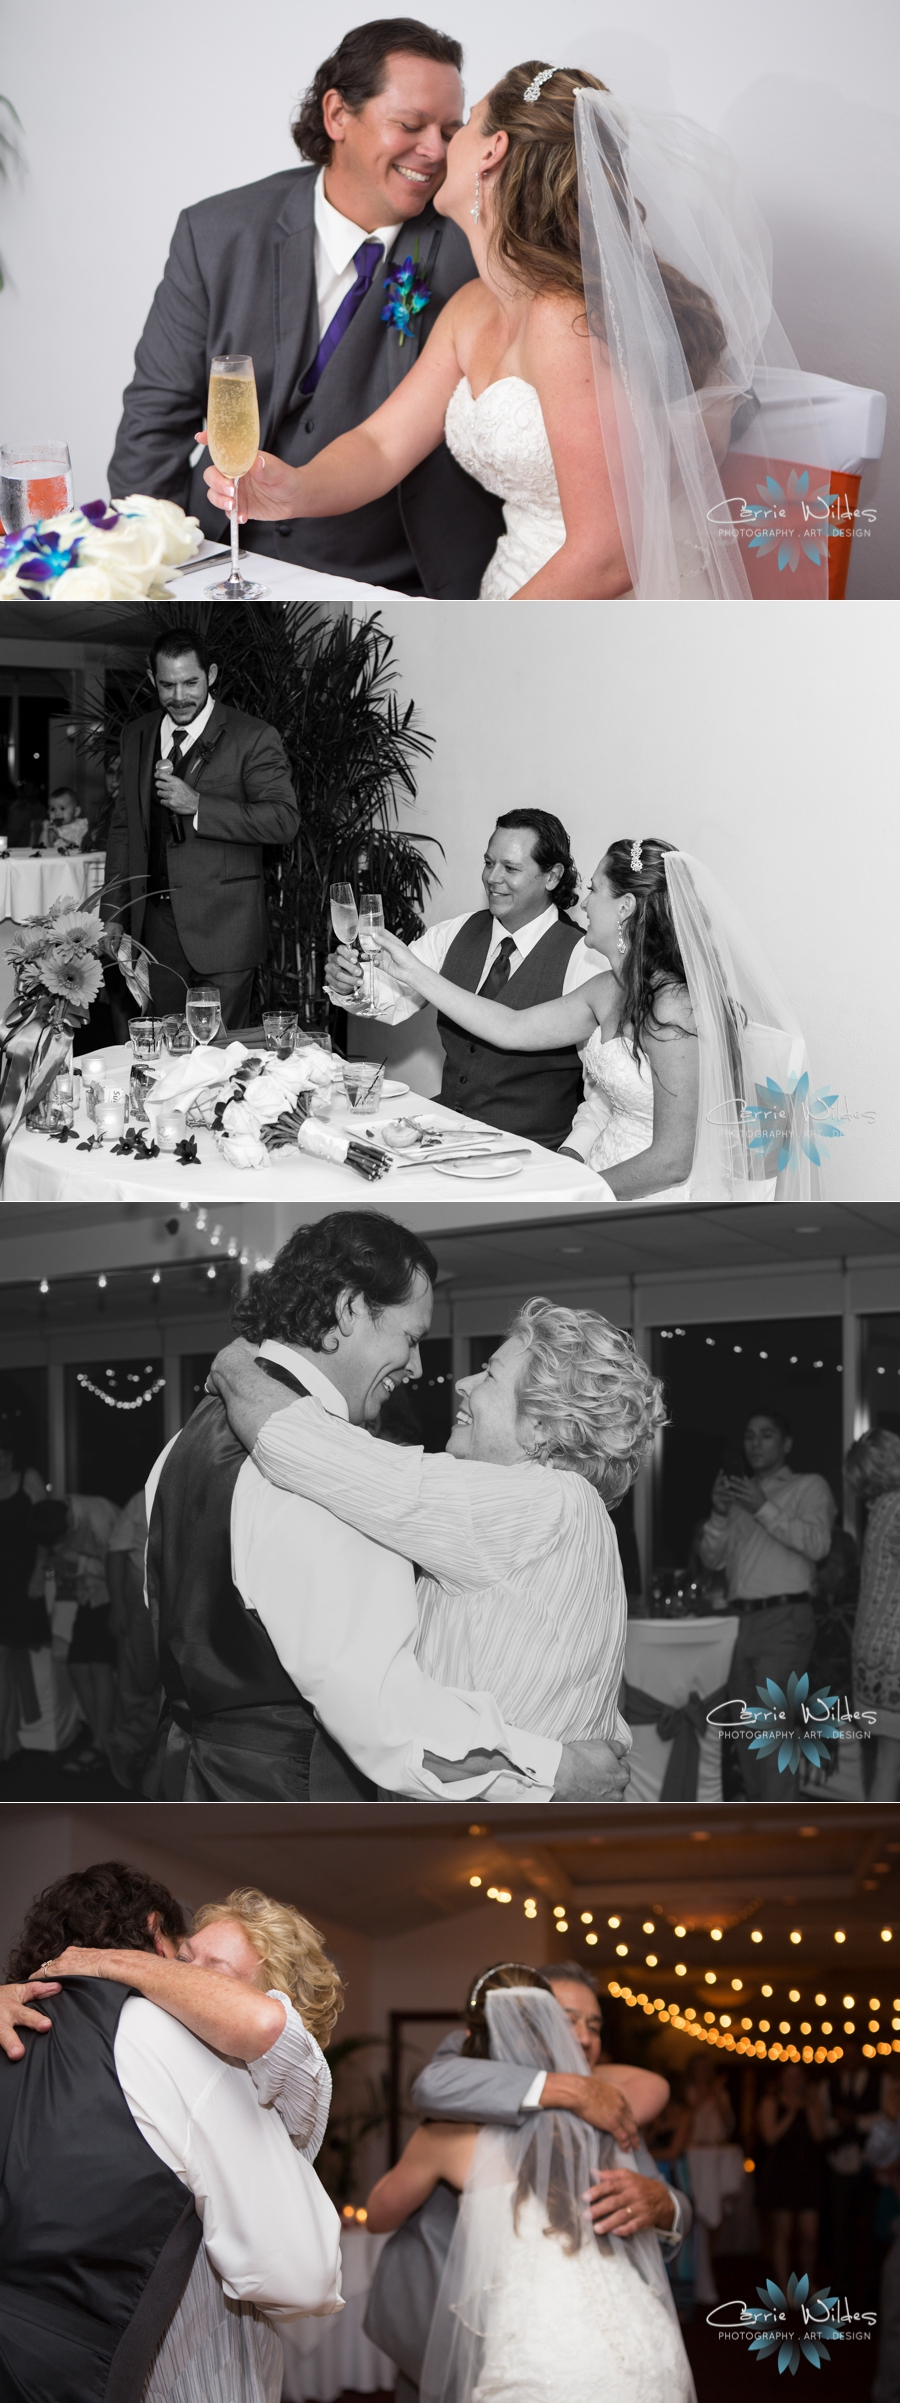 10_15_16 Adora and Josh Marina Jacks Wedding_0038.jpg